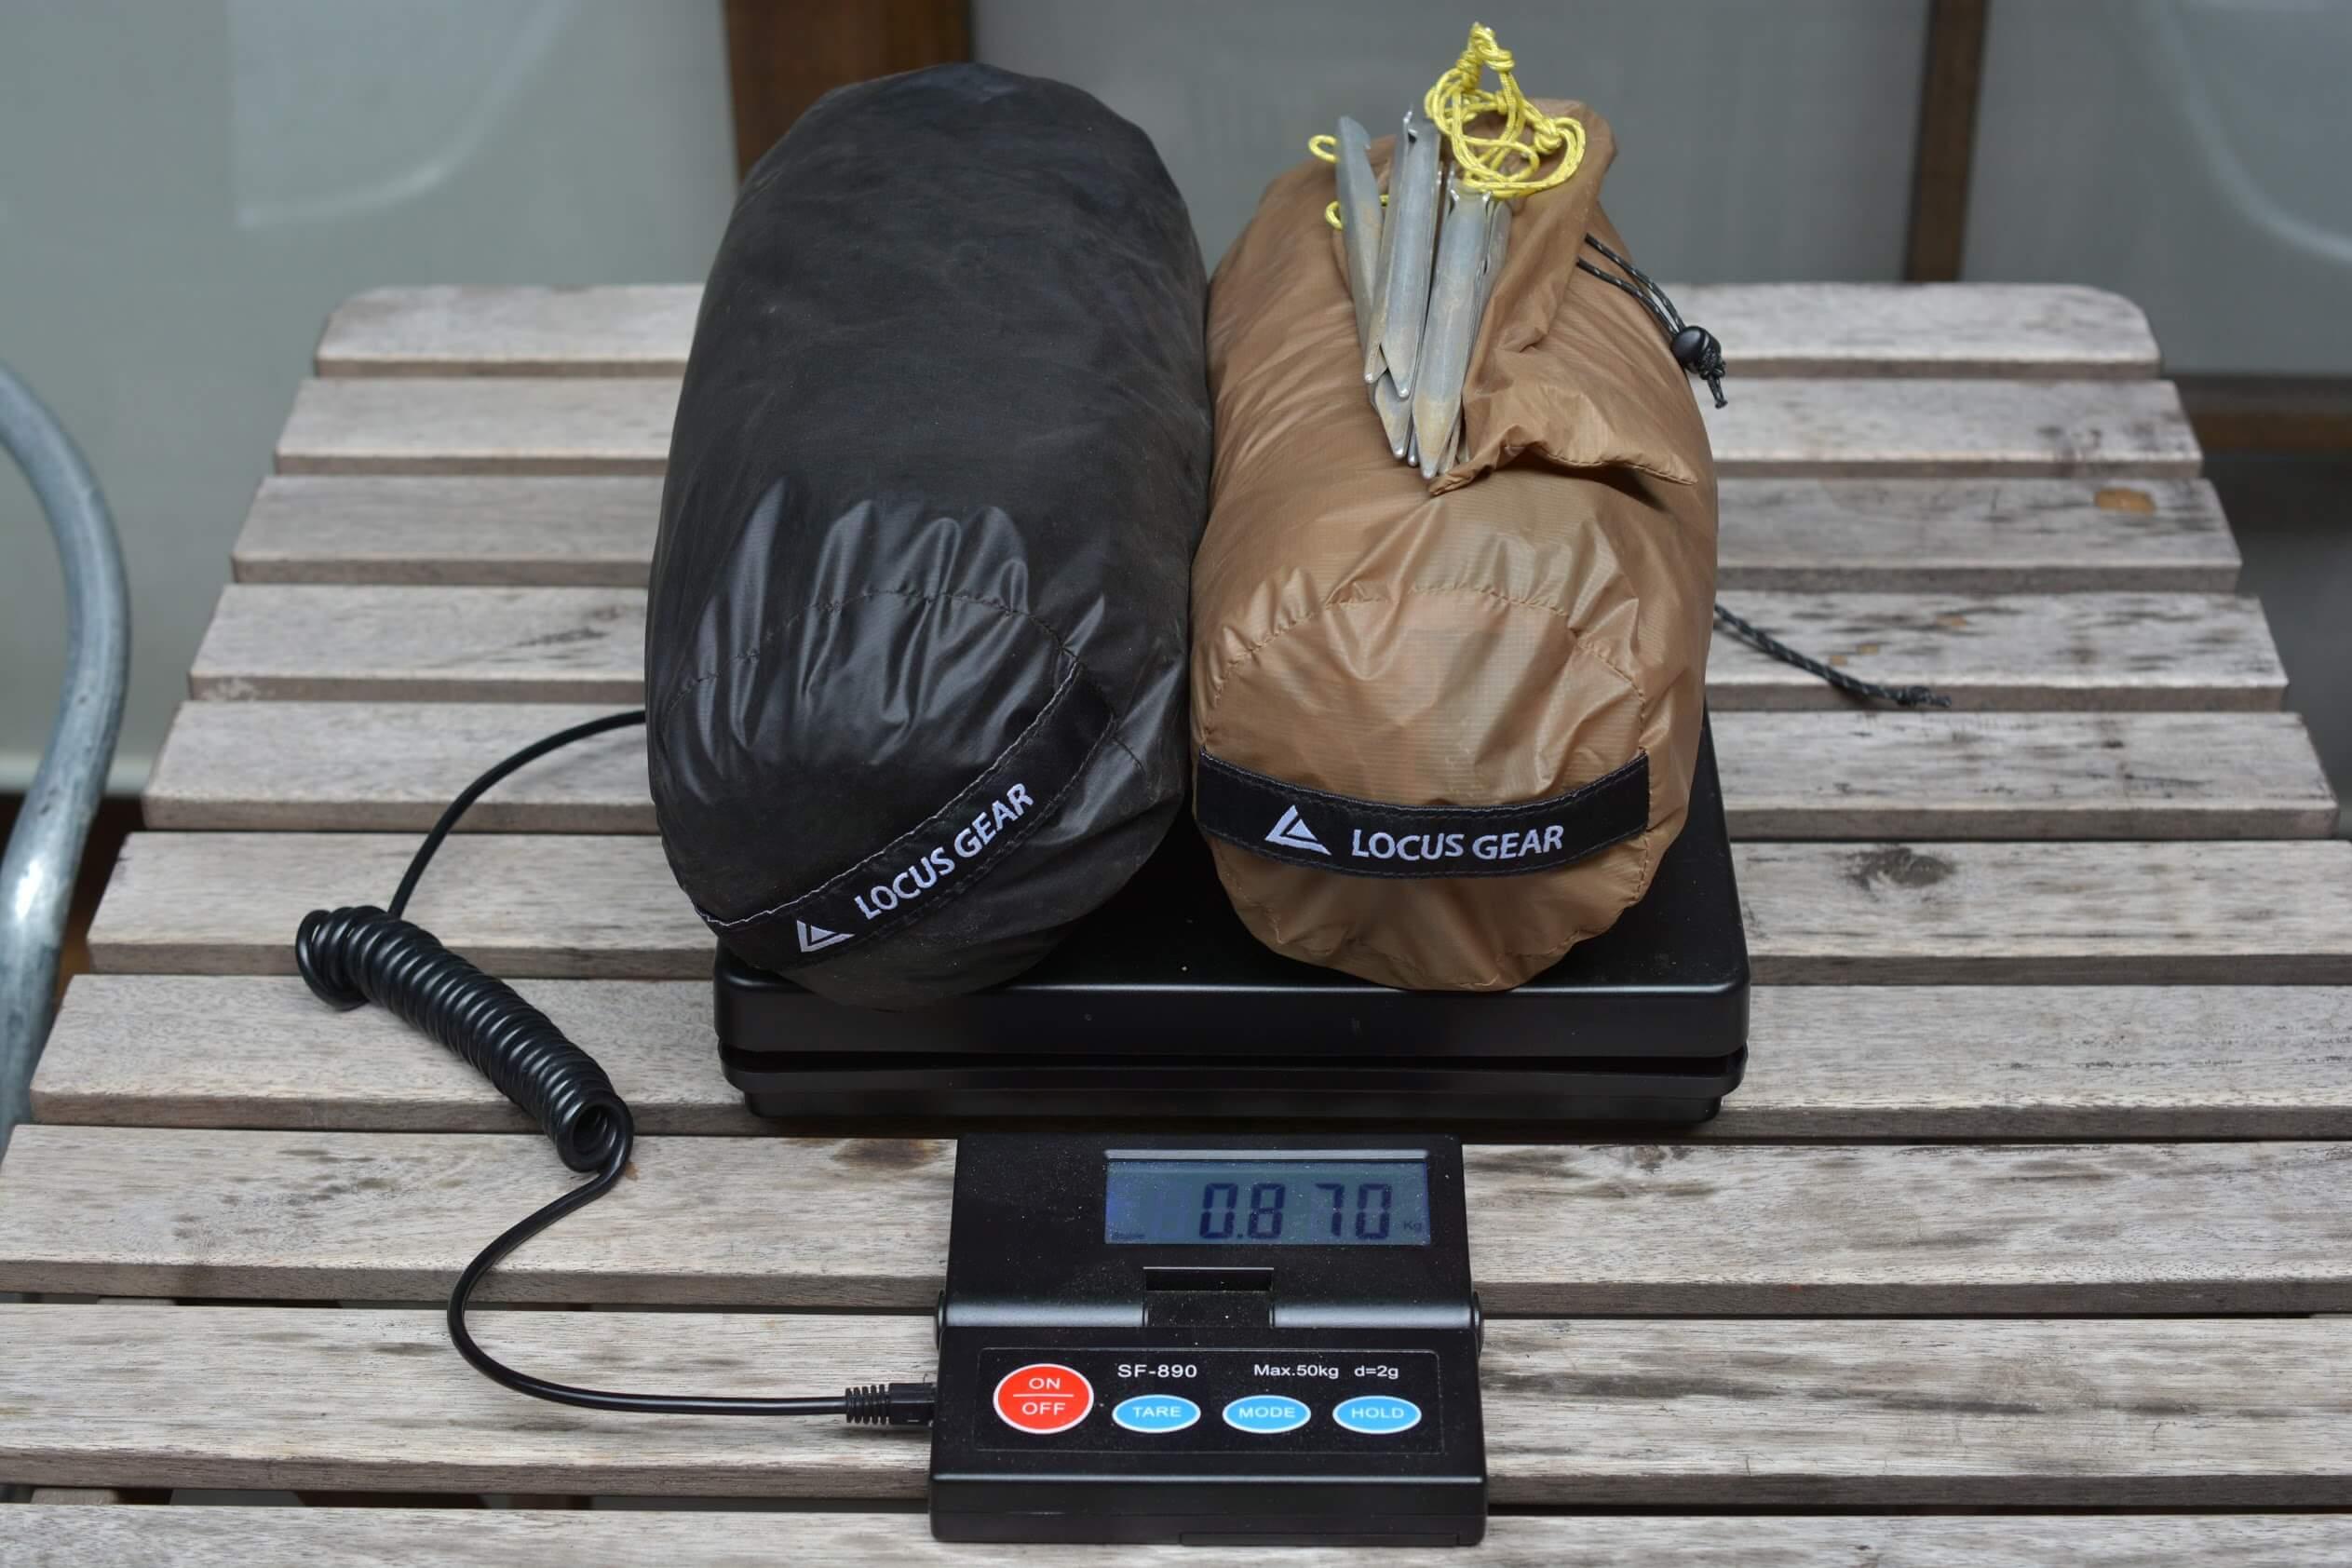 LocusGear Khufu HB / ローカスギア クフ HB トータル重量